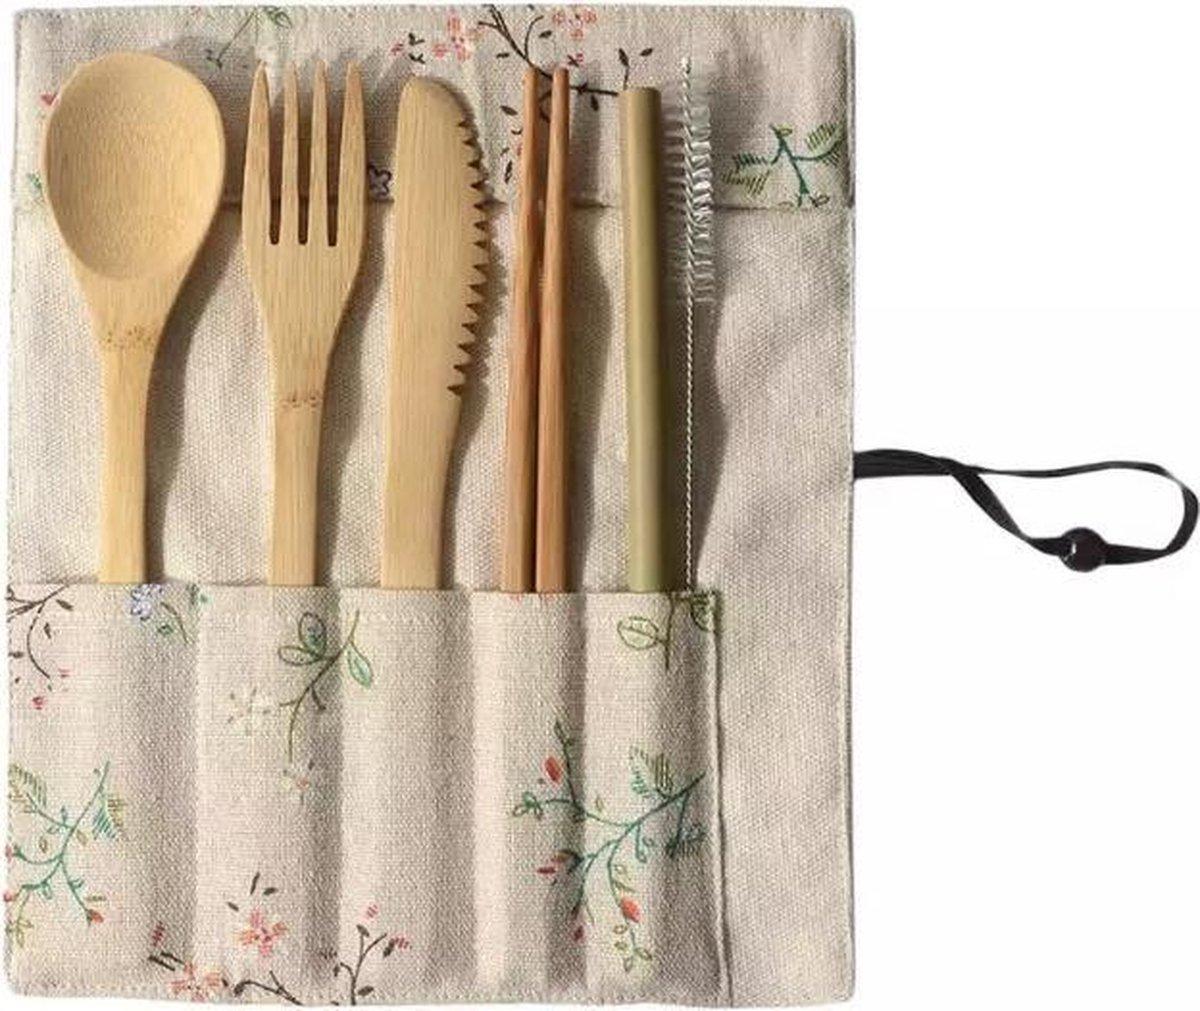 SALE!!! - Bamboe bestekset - Reisbestek - Reizen - Voor Onderweg - Camping Bestek - Plant Print